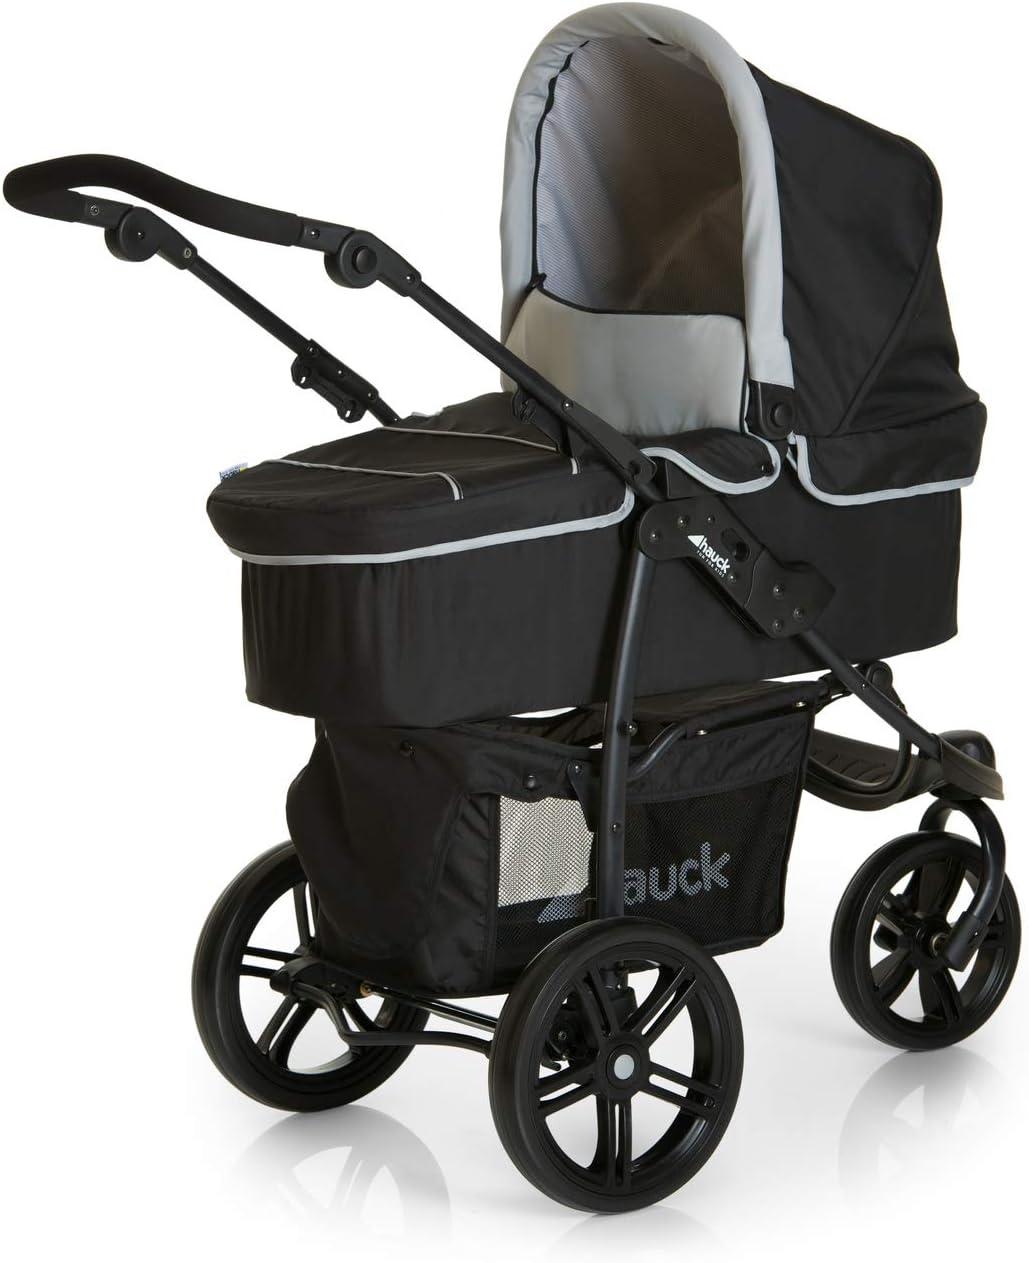 silla de auto gr ligero plegable compacto Carro deportivo 3 ruedas manillar ajustable en altura respaldo reclinable 0 meses a 25 kg Hauck Viper SLX Trio Set negro gris capazo con colchon